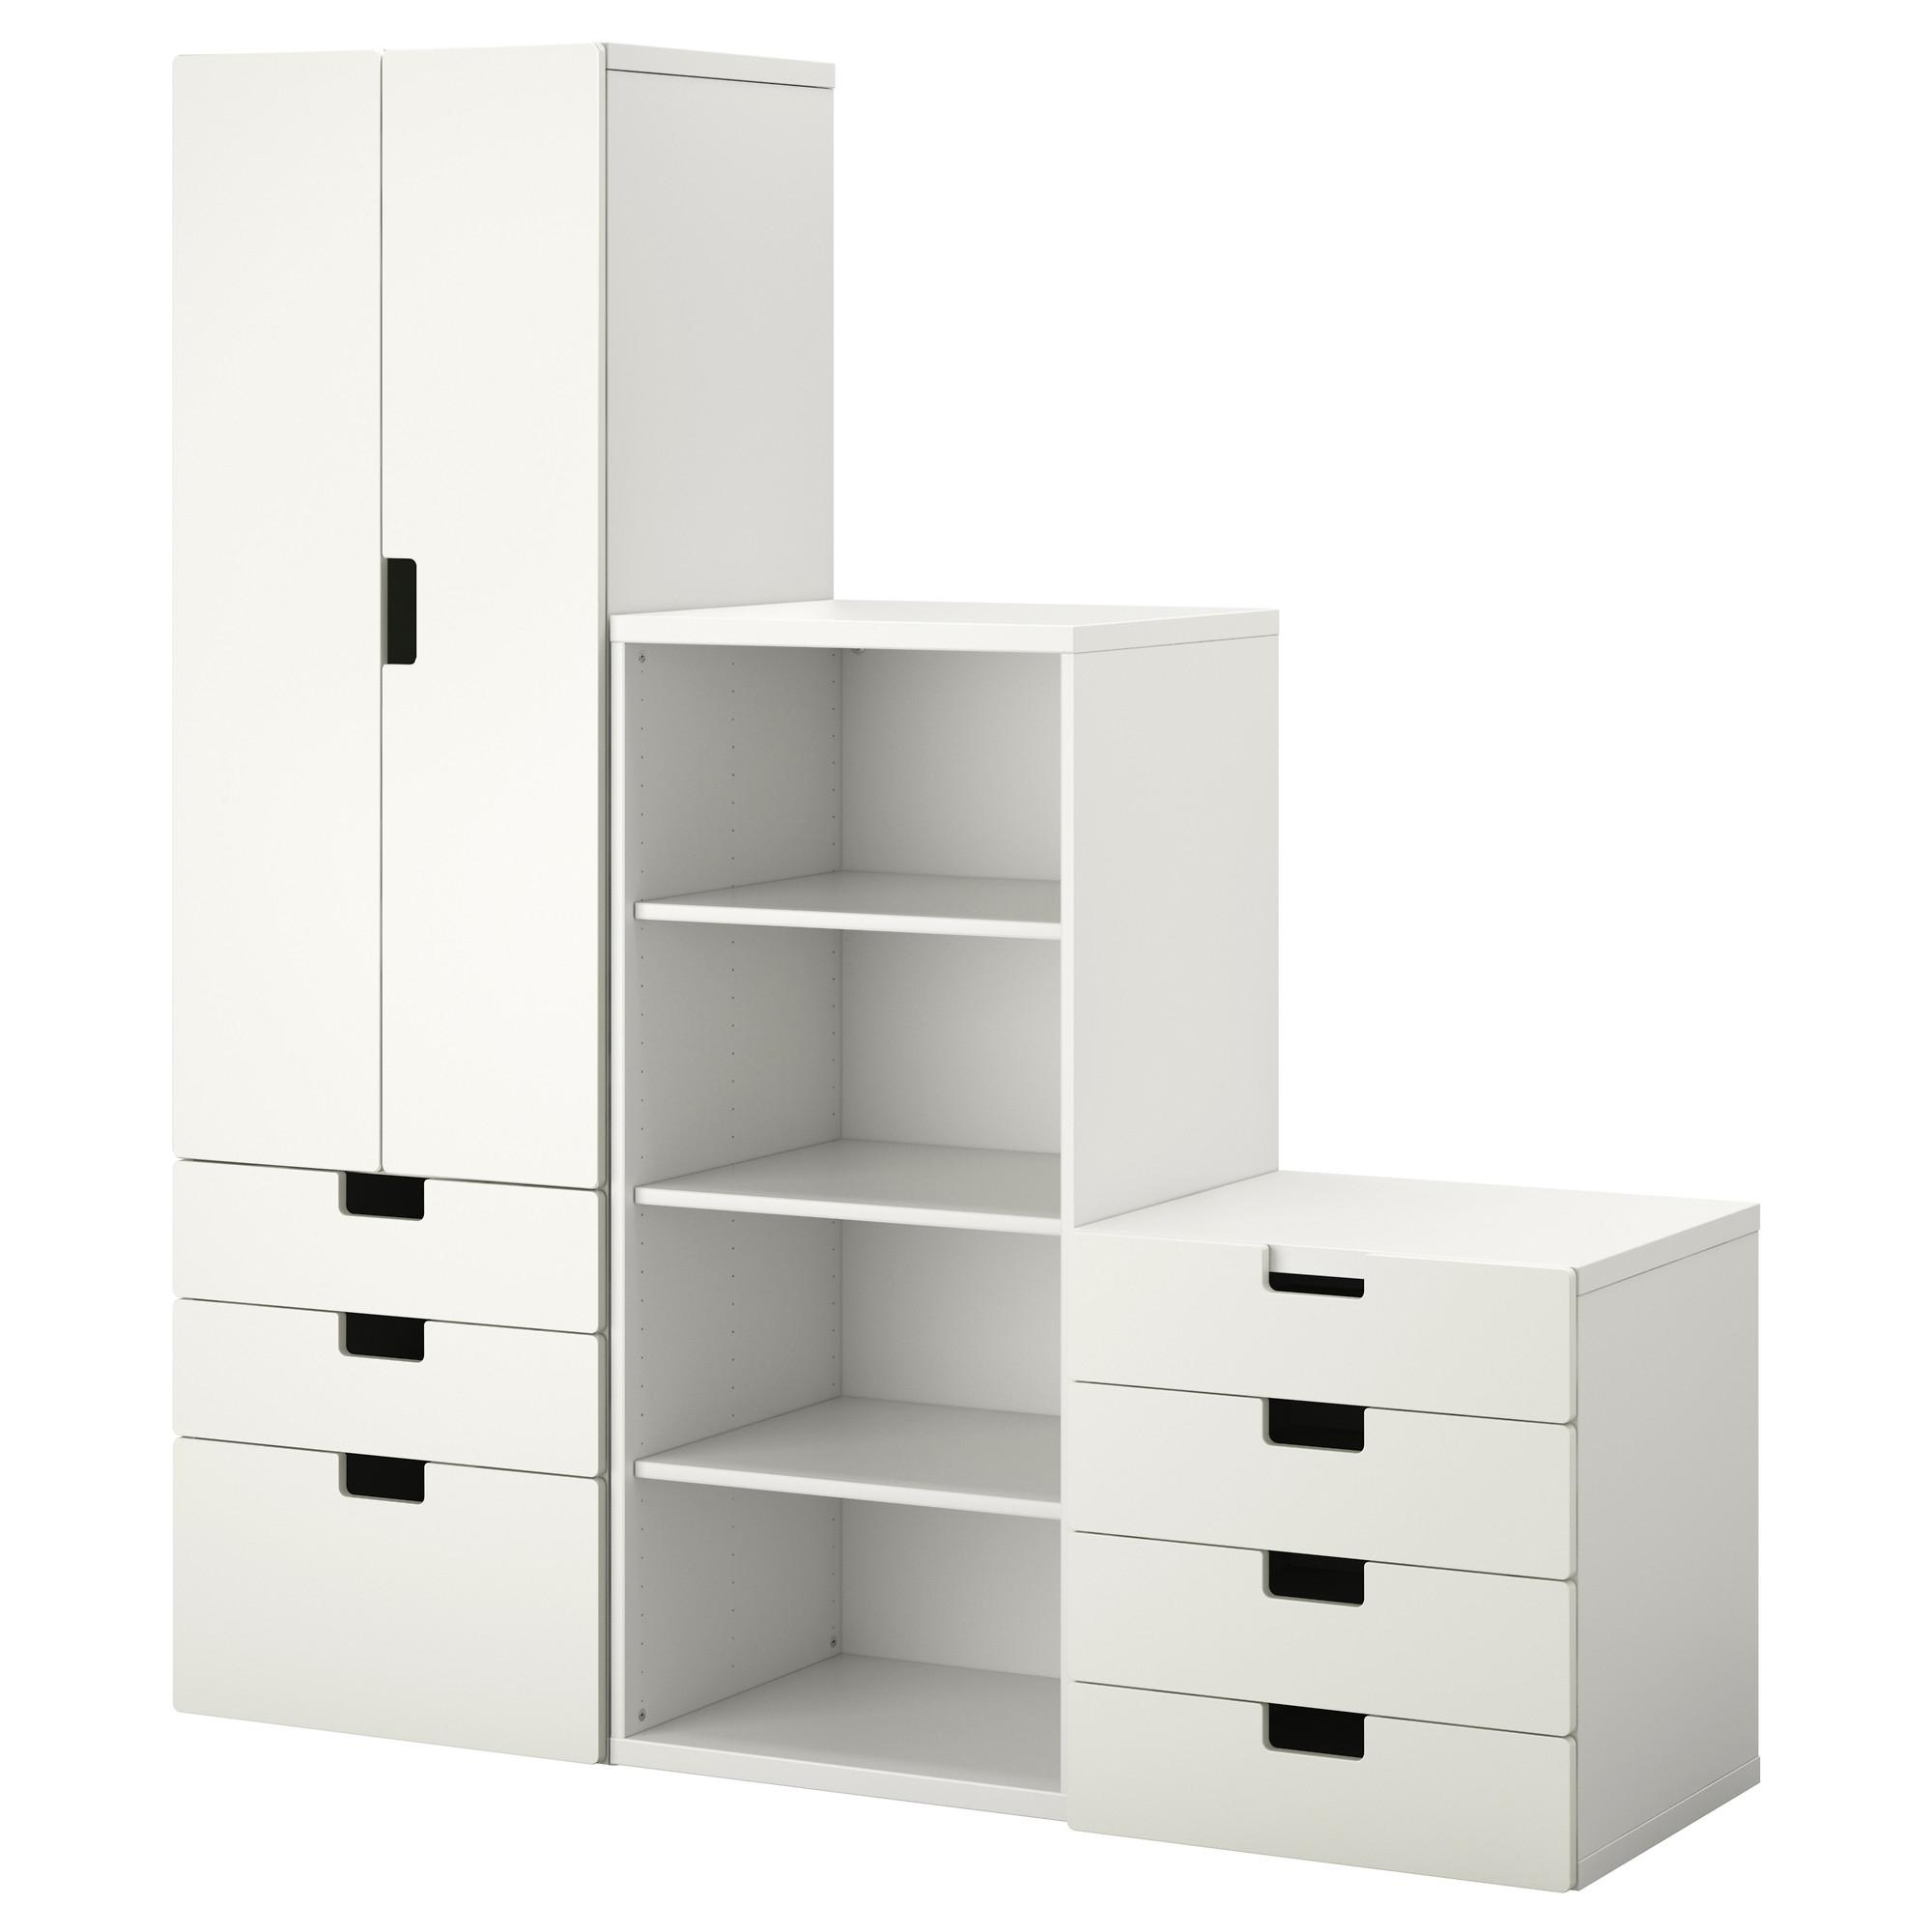 Ikea gran canaria detalles producto - Banco exterior ikea ...